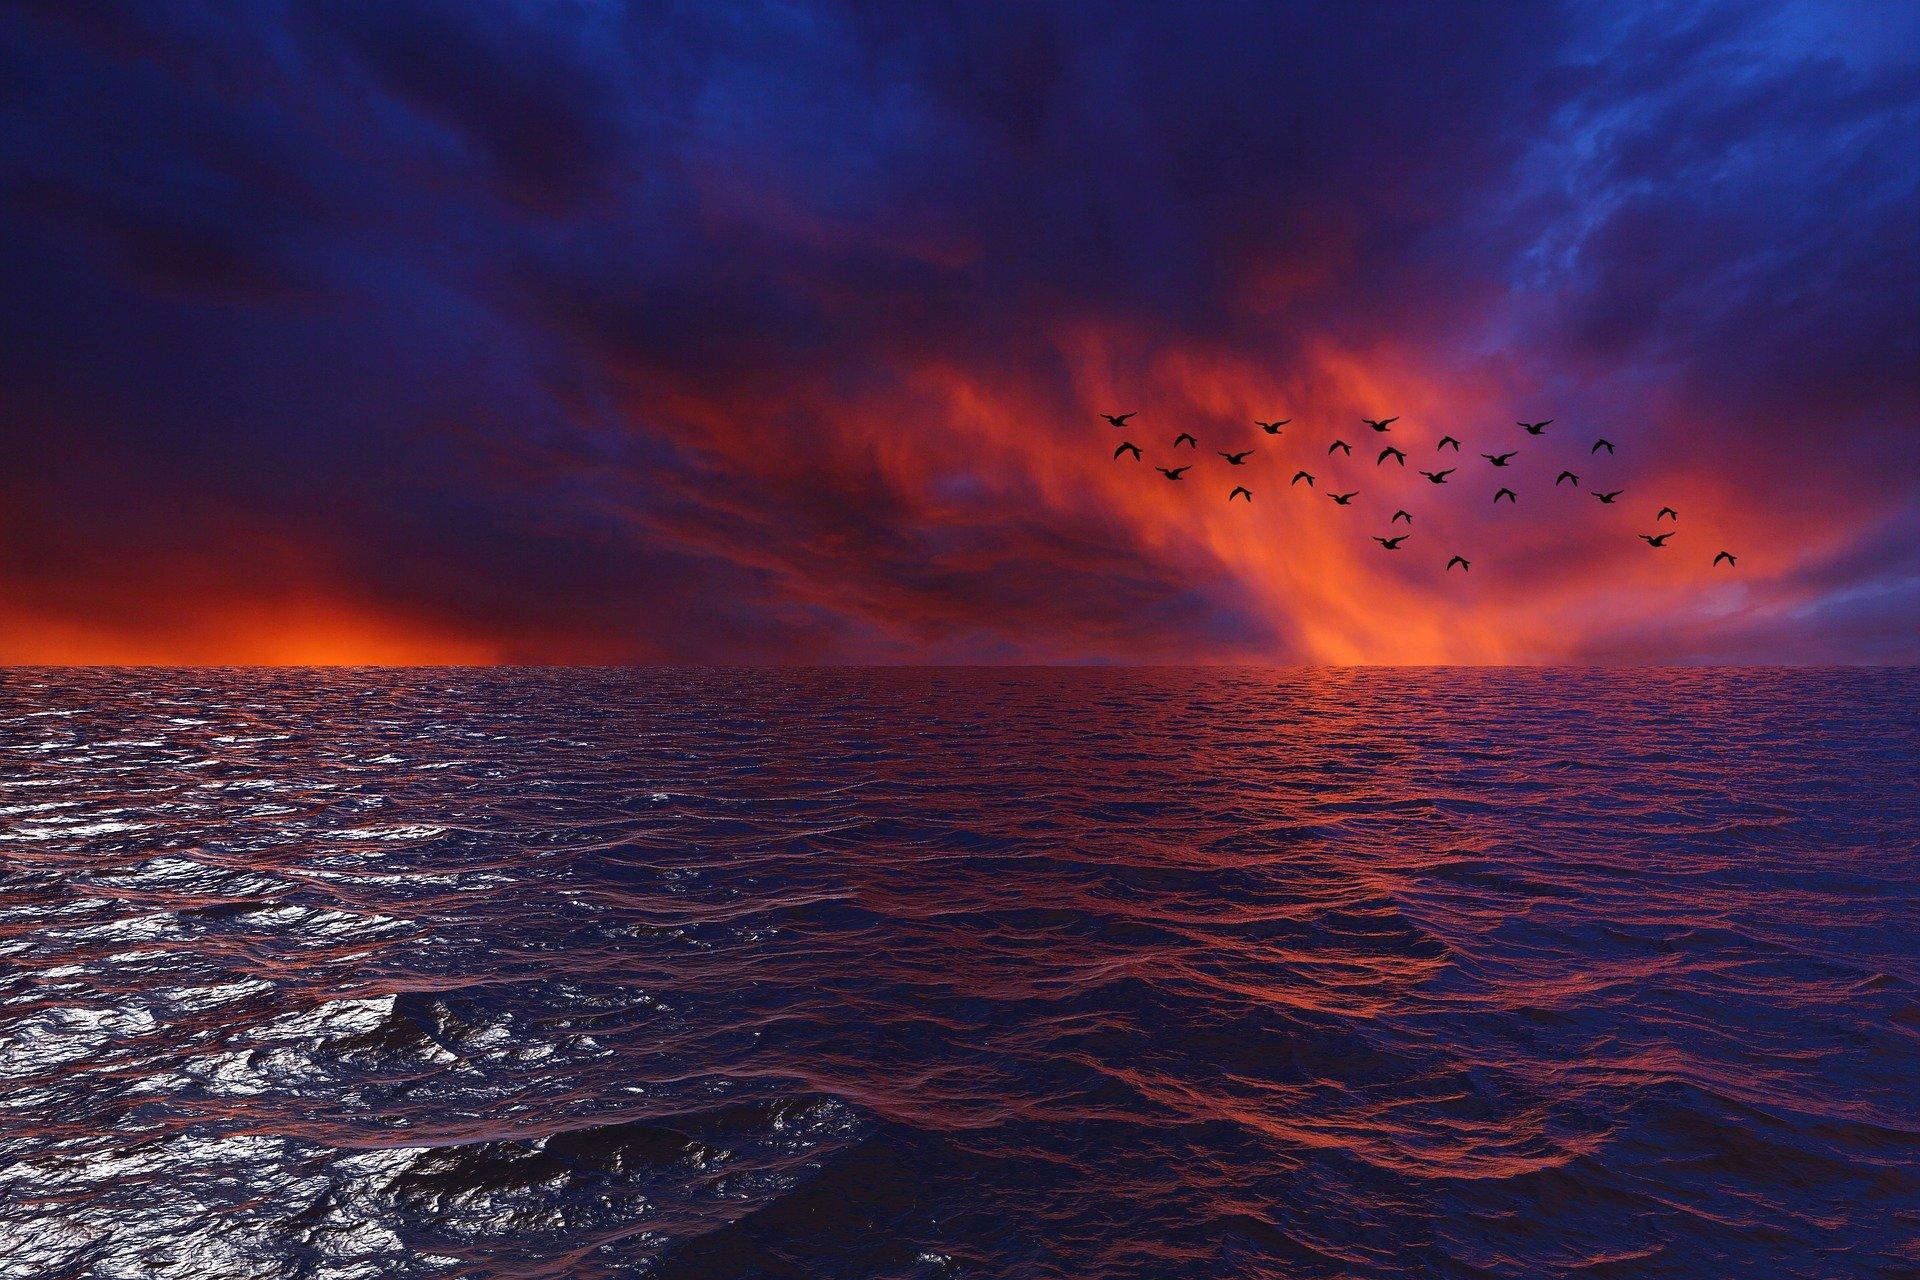 sunset-3816247_1920